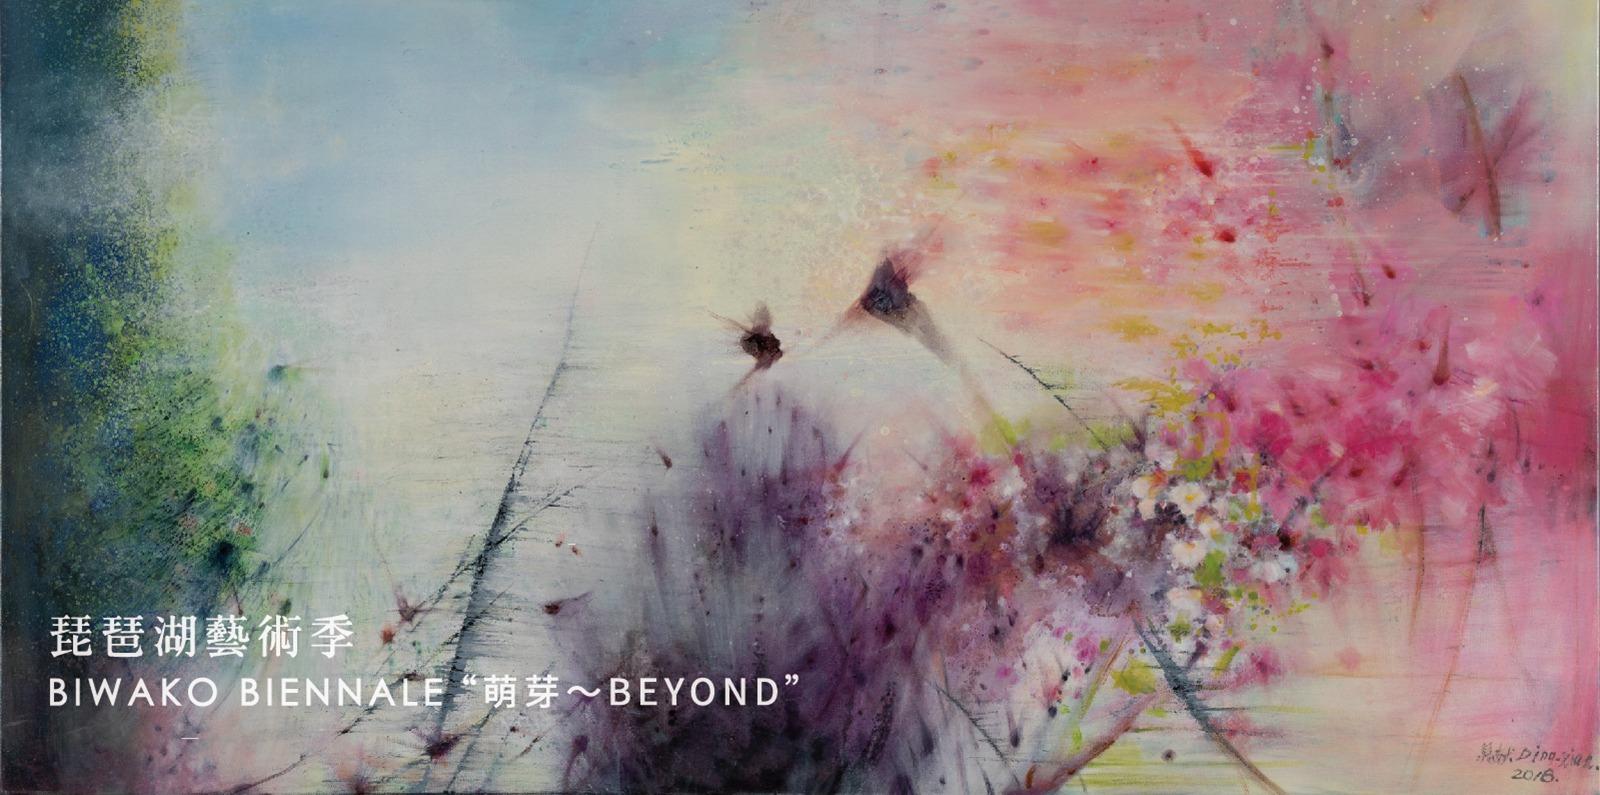 BIWAKO BIENNALE 2018【萌芽~BEYOND】